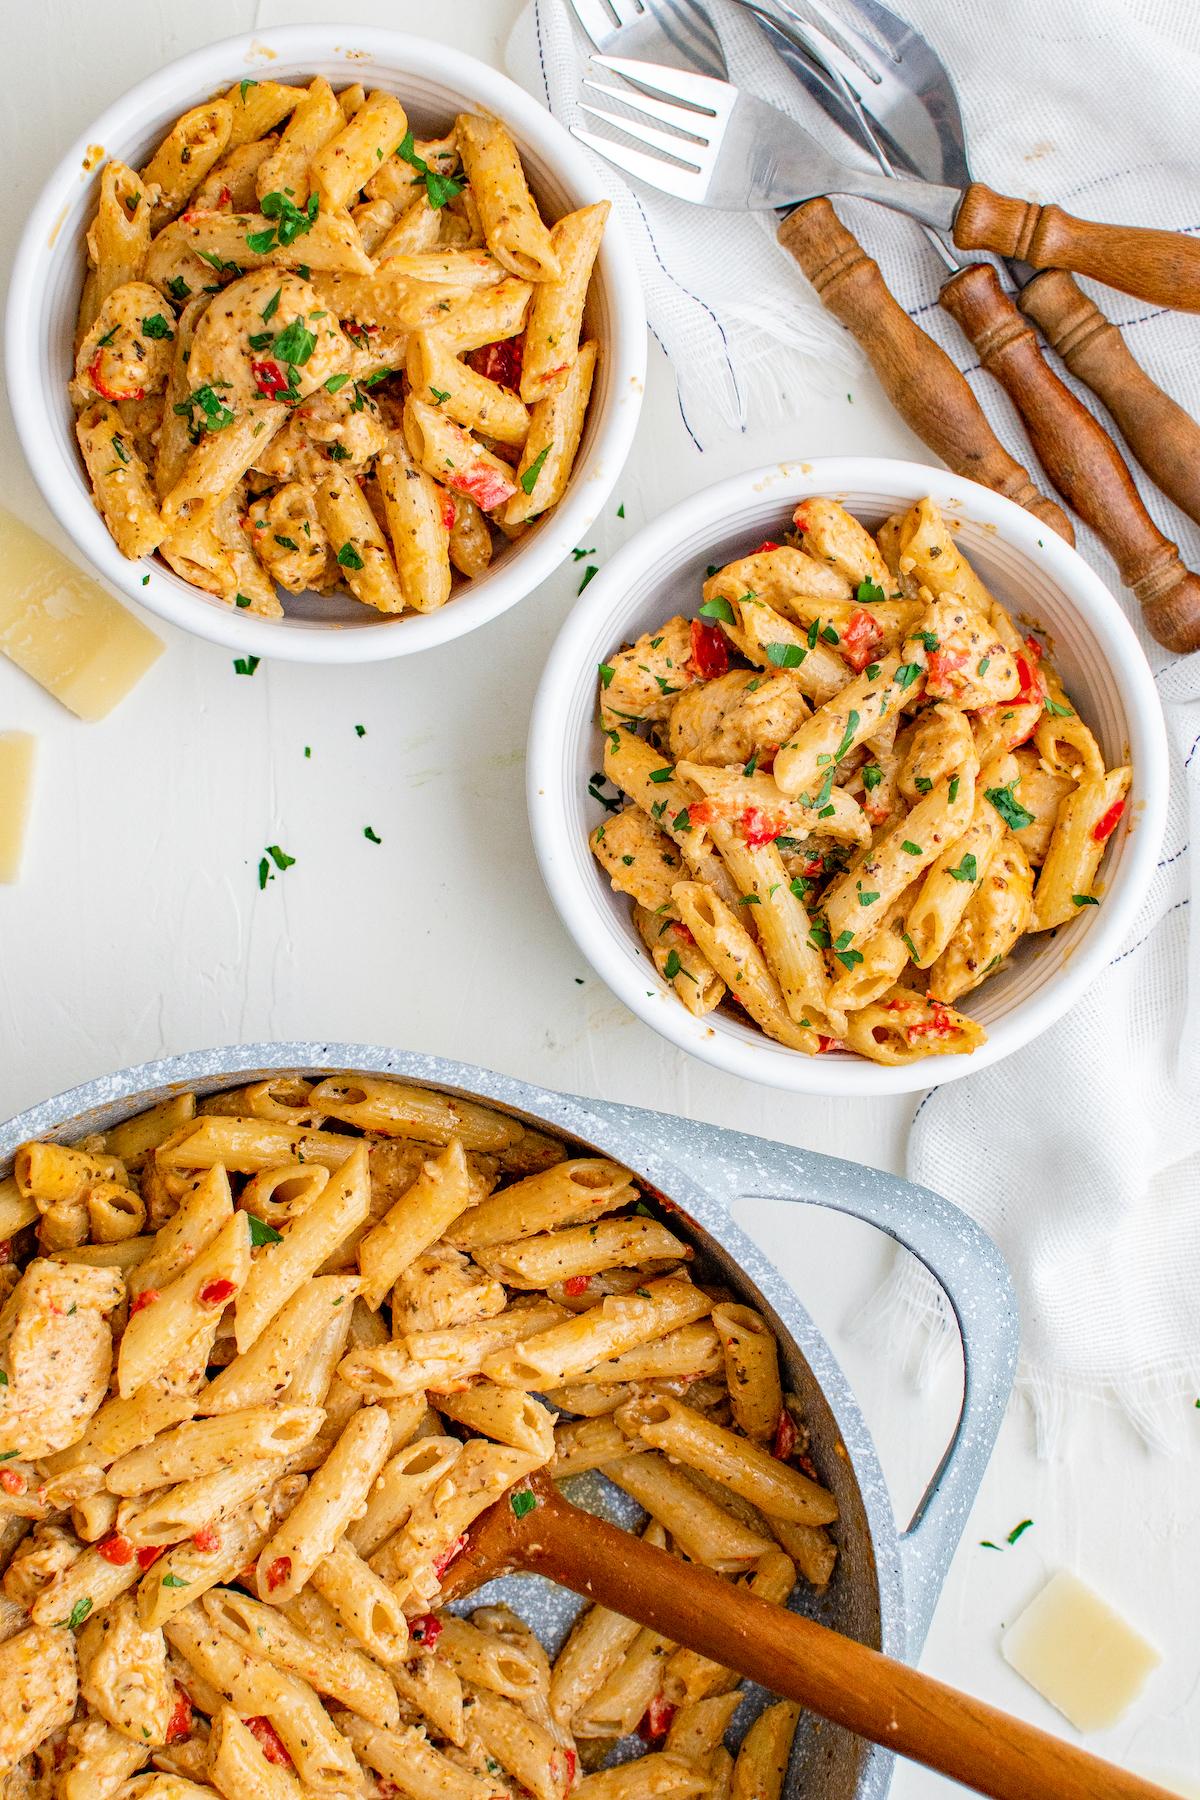 Two bowls of Cajun chicken pasta.